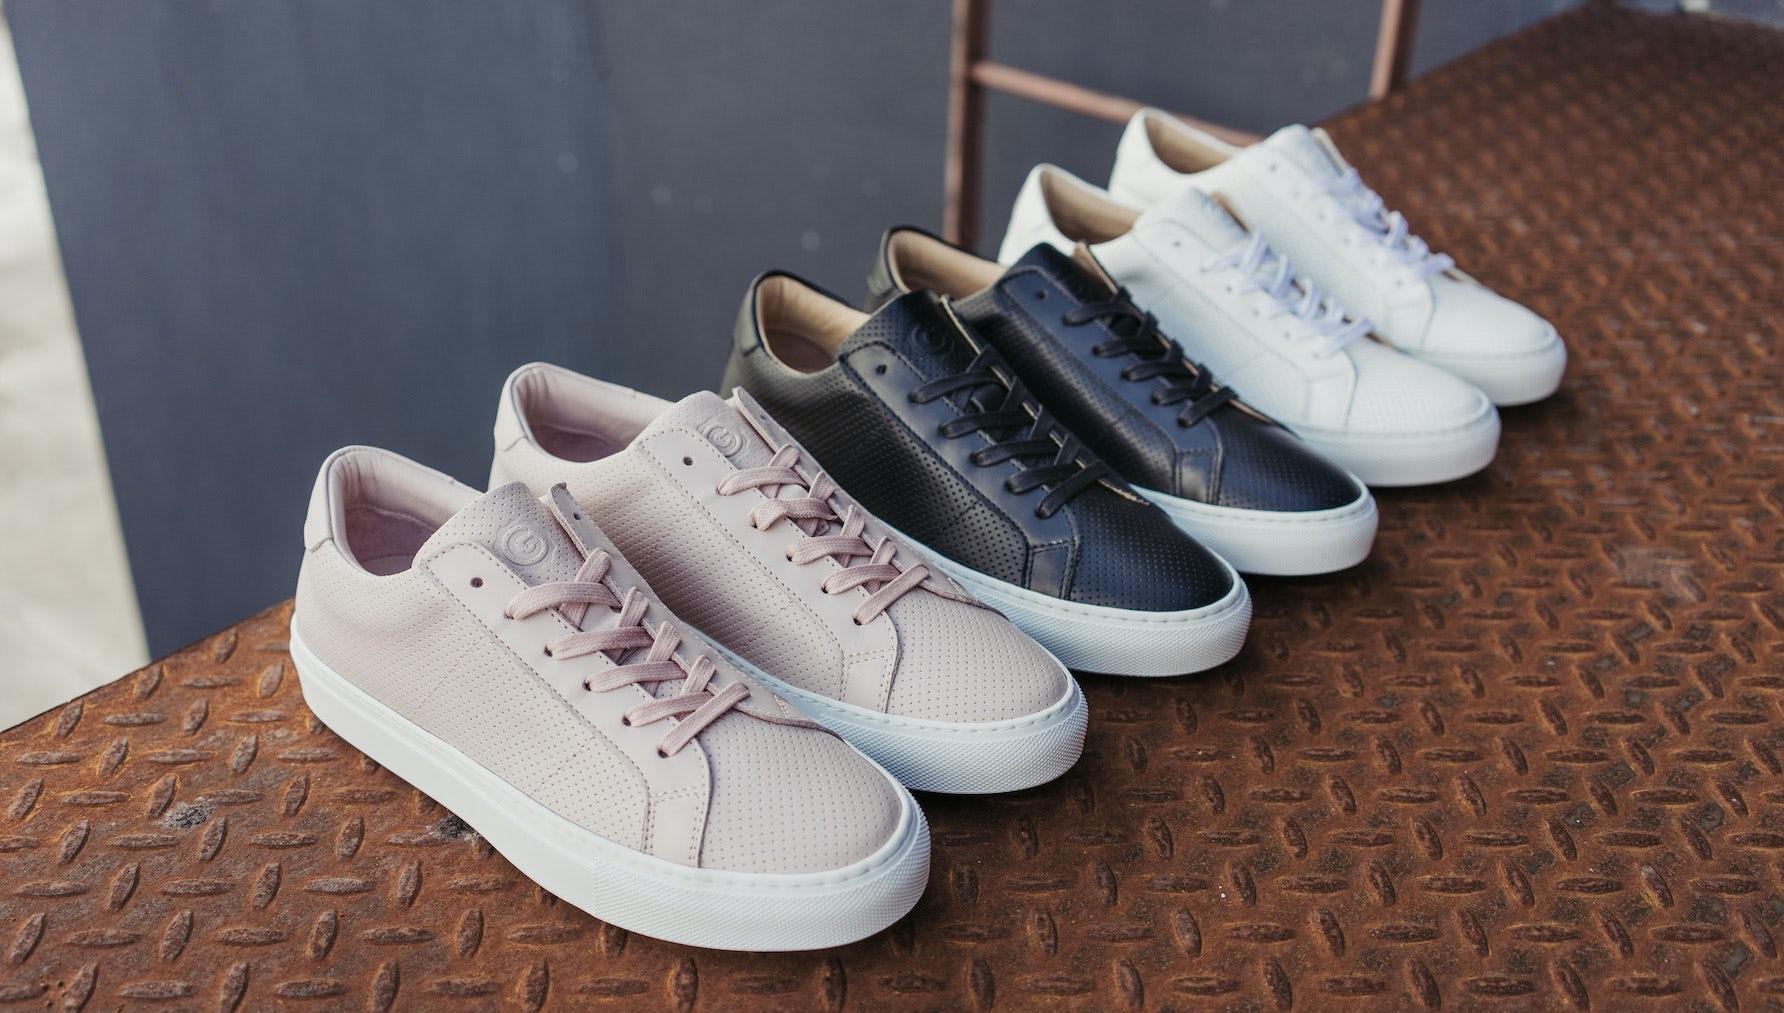 Disruptive Sneaker Brand Greats